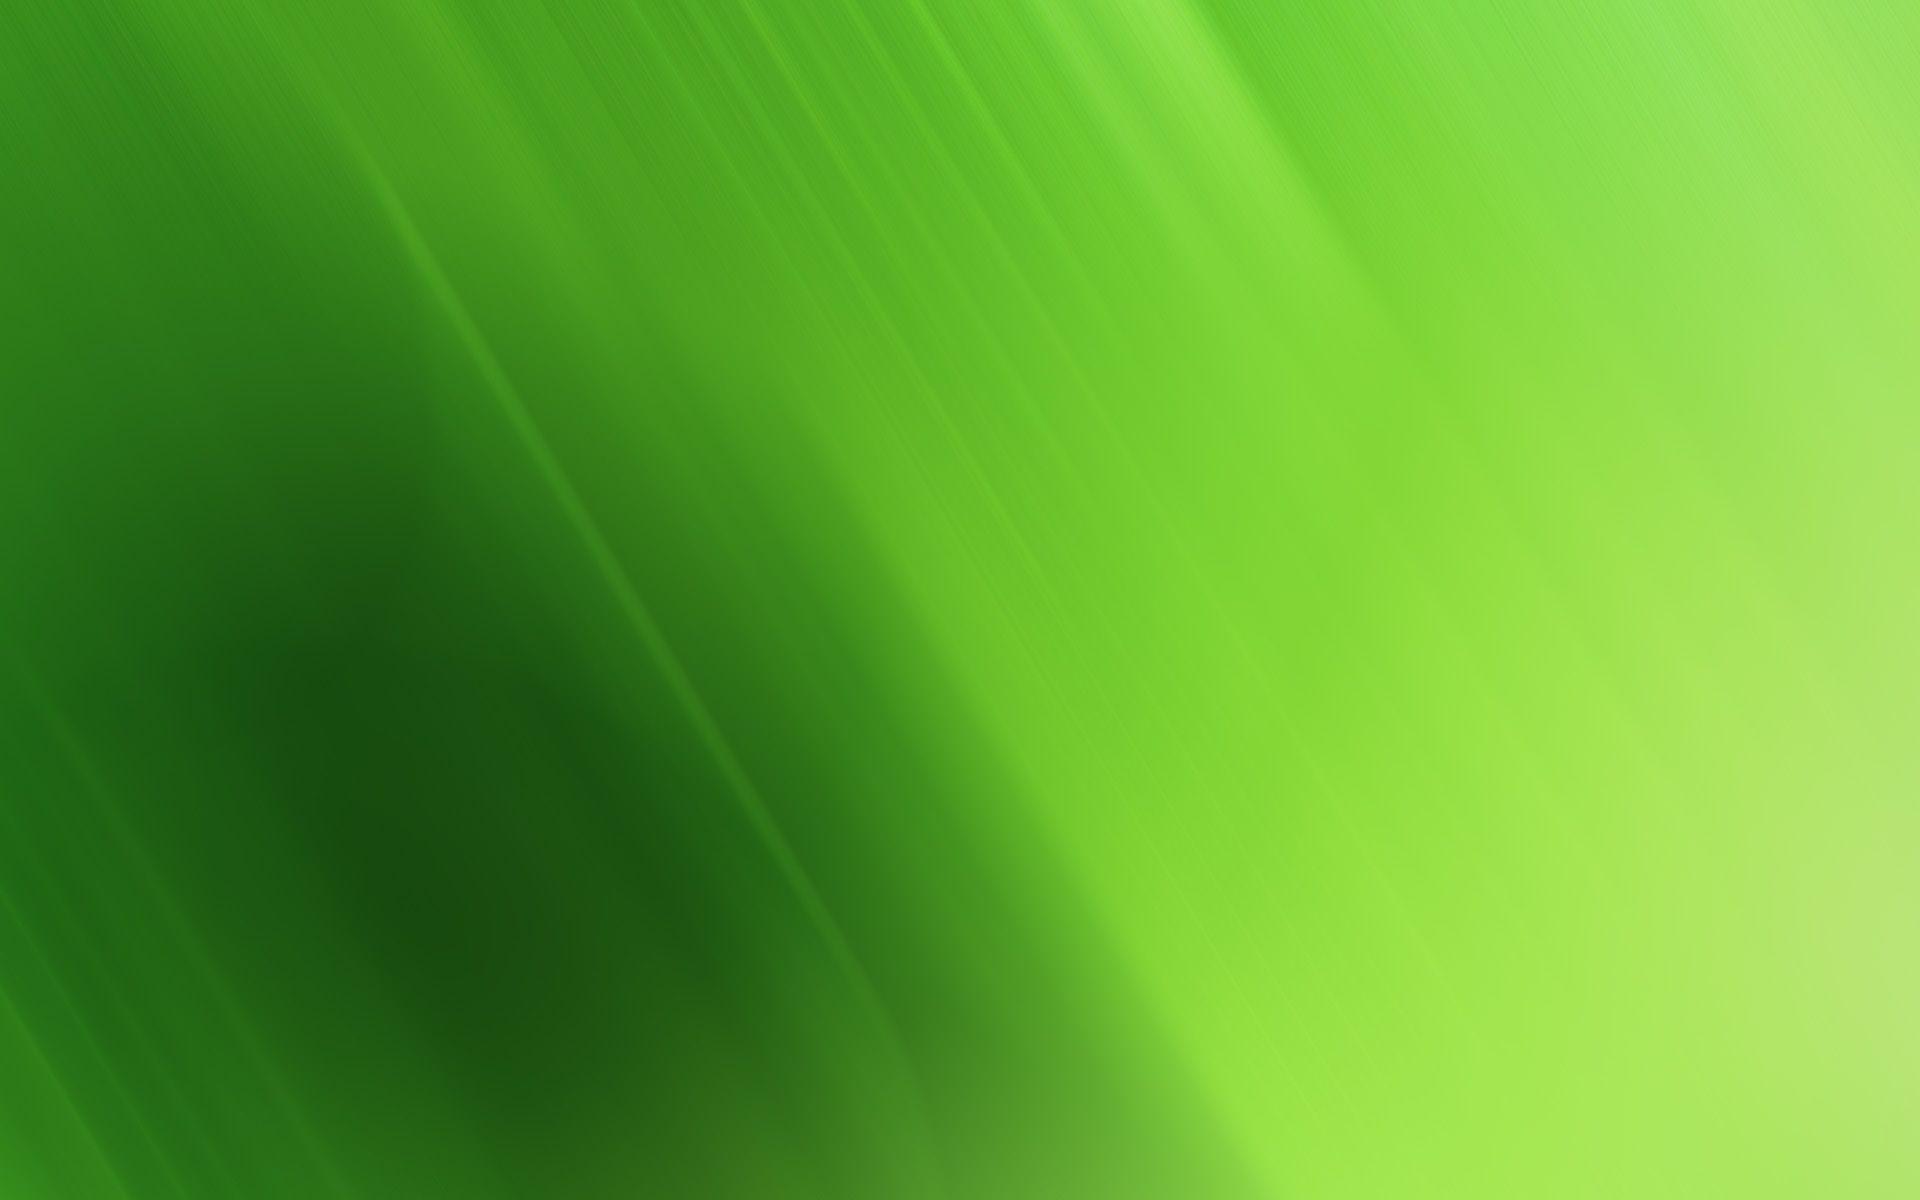 Green Desktop Wallpapers Wallpaper Cave